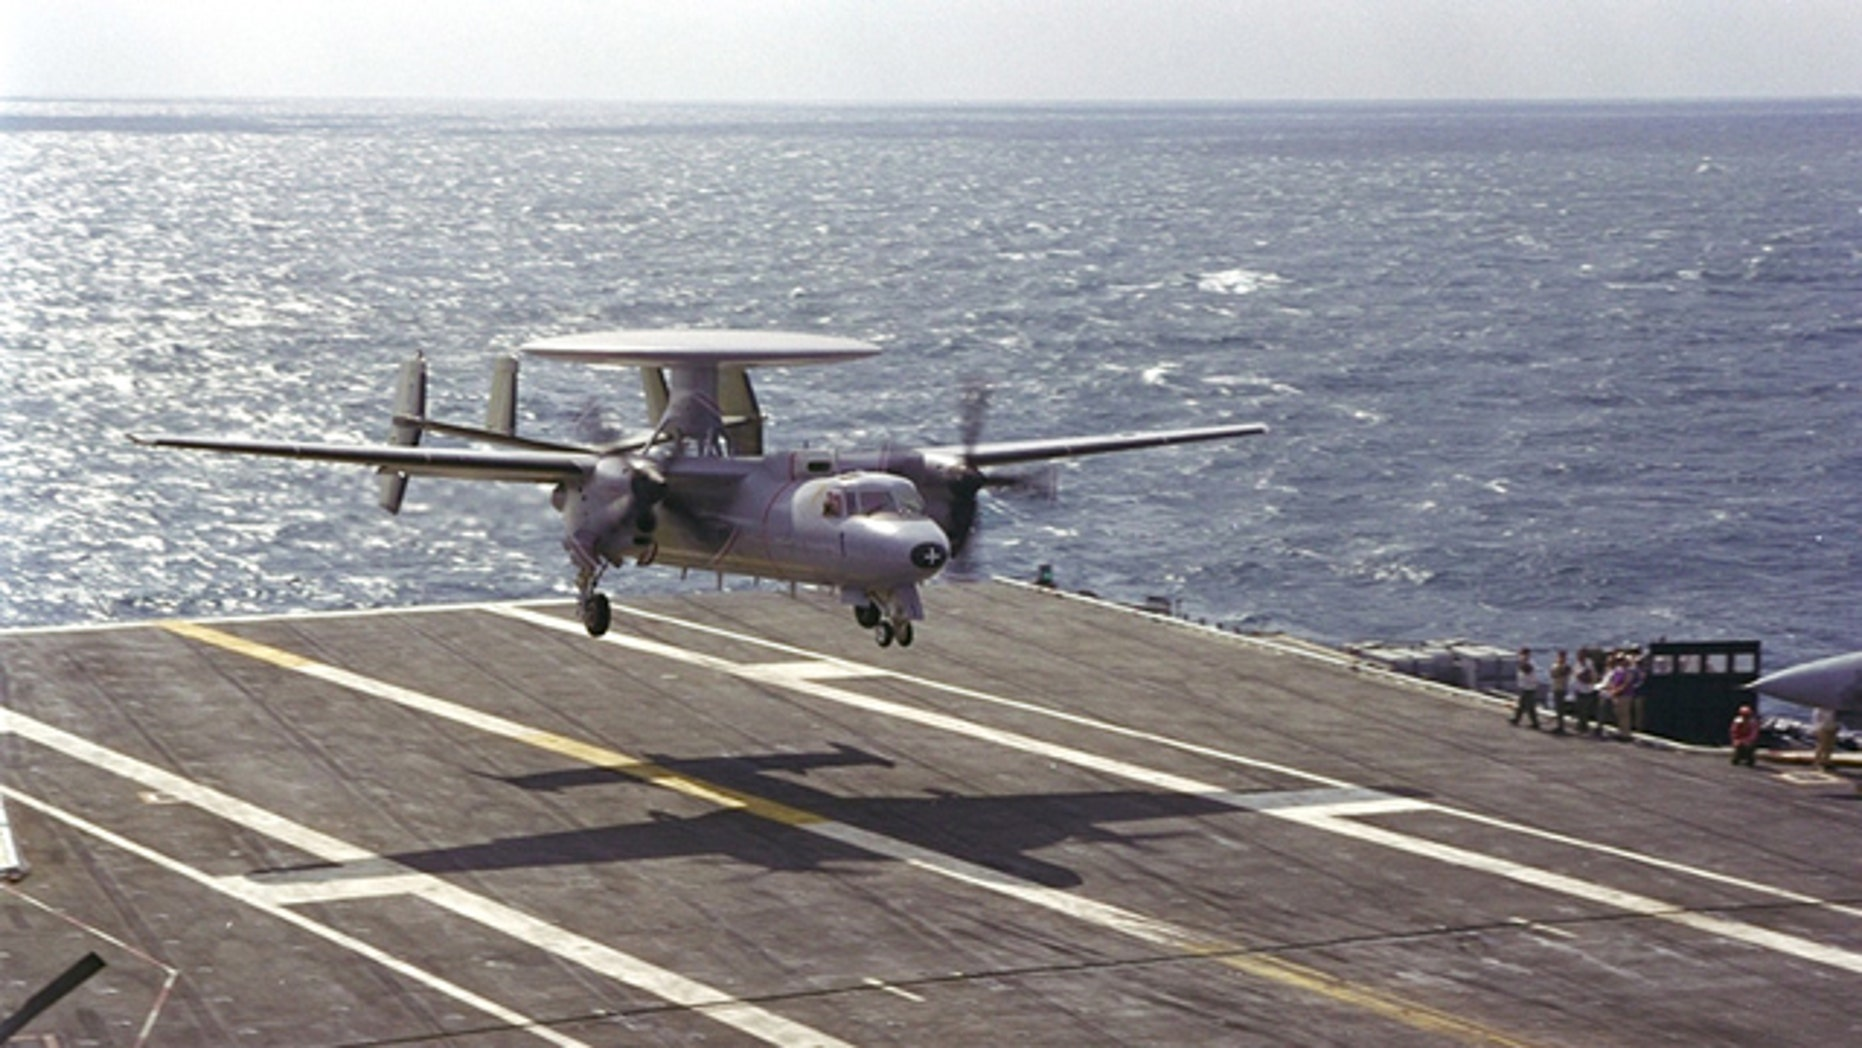 A Northrop Grumman E-2C Hawkeye 2000 surveillance and reconnaisance plane lands on a carrier.